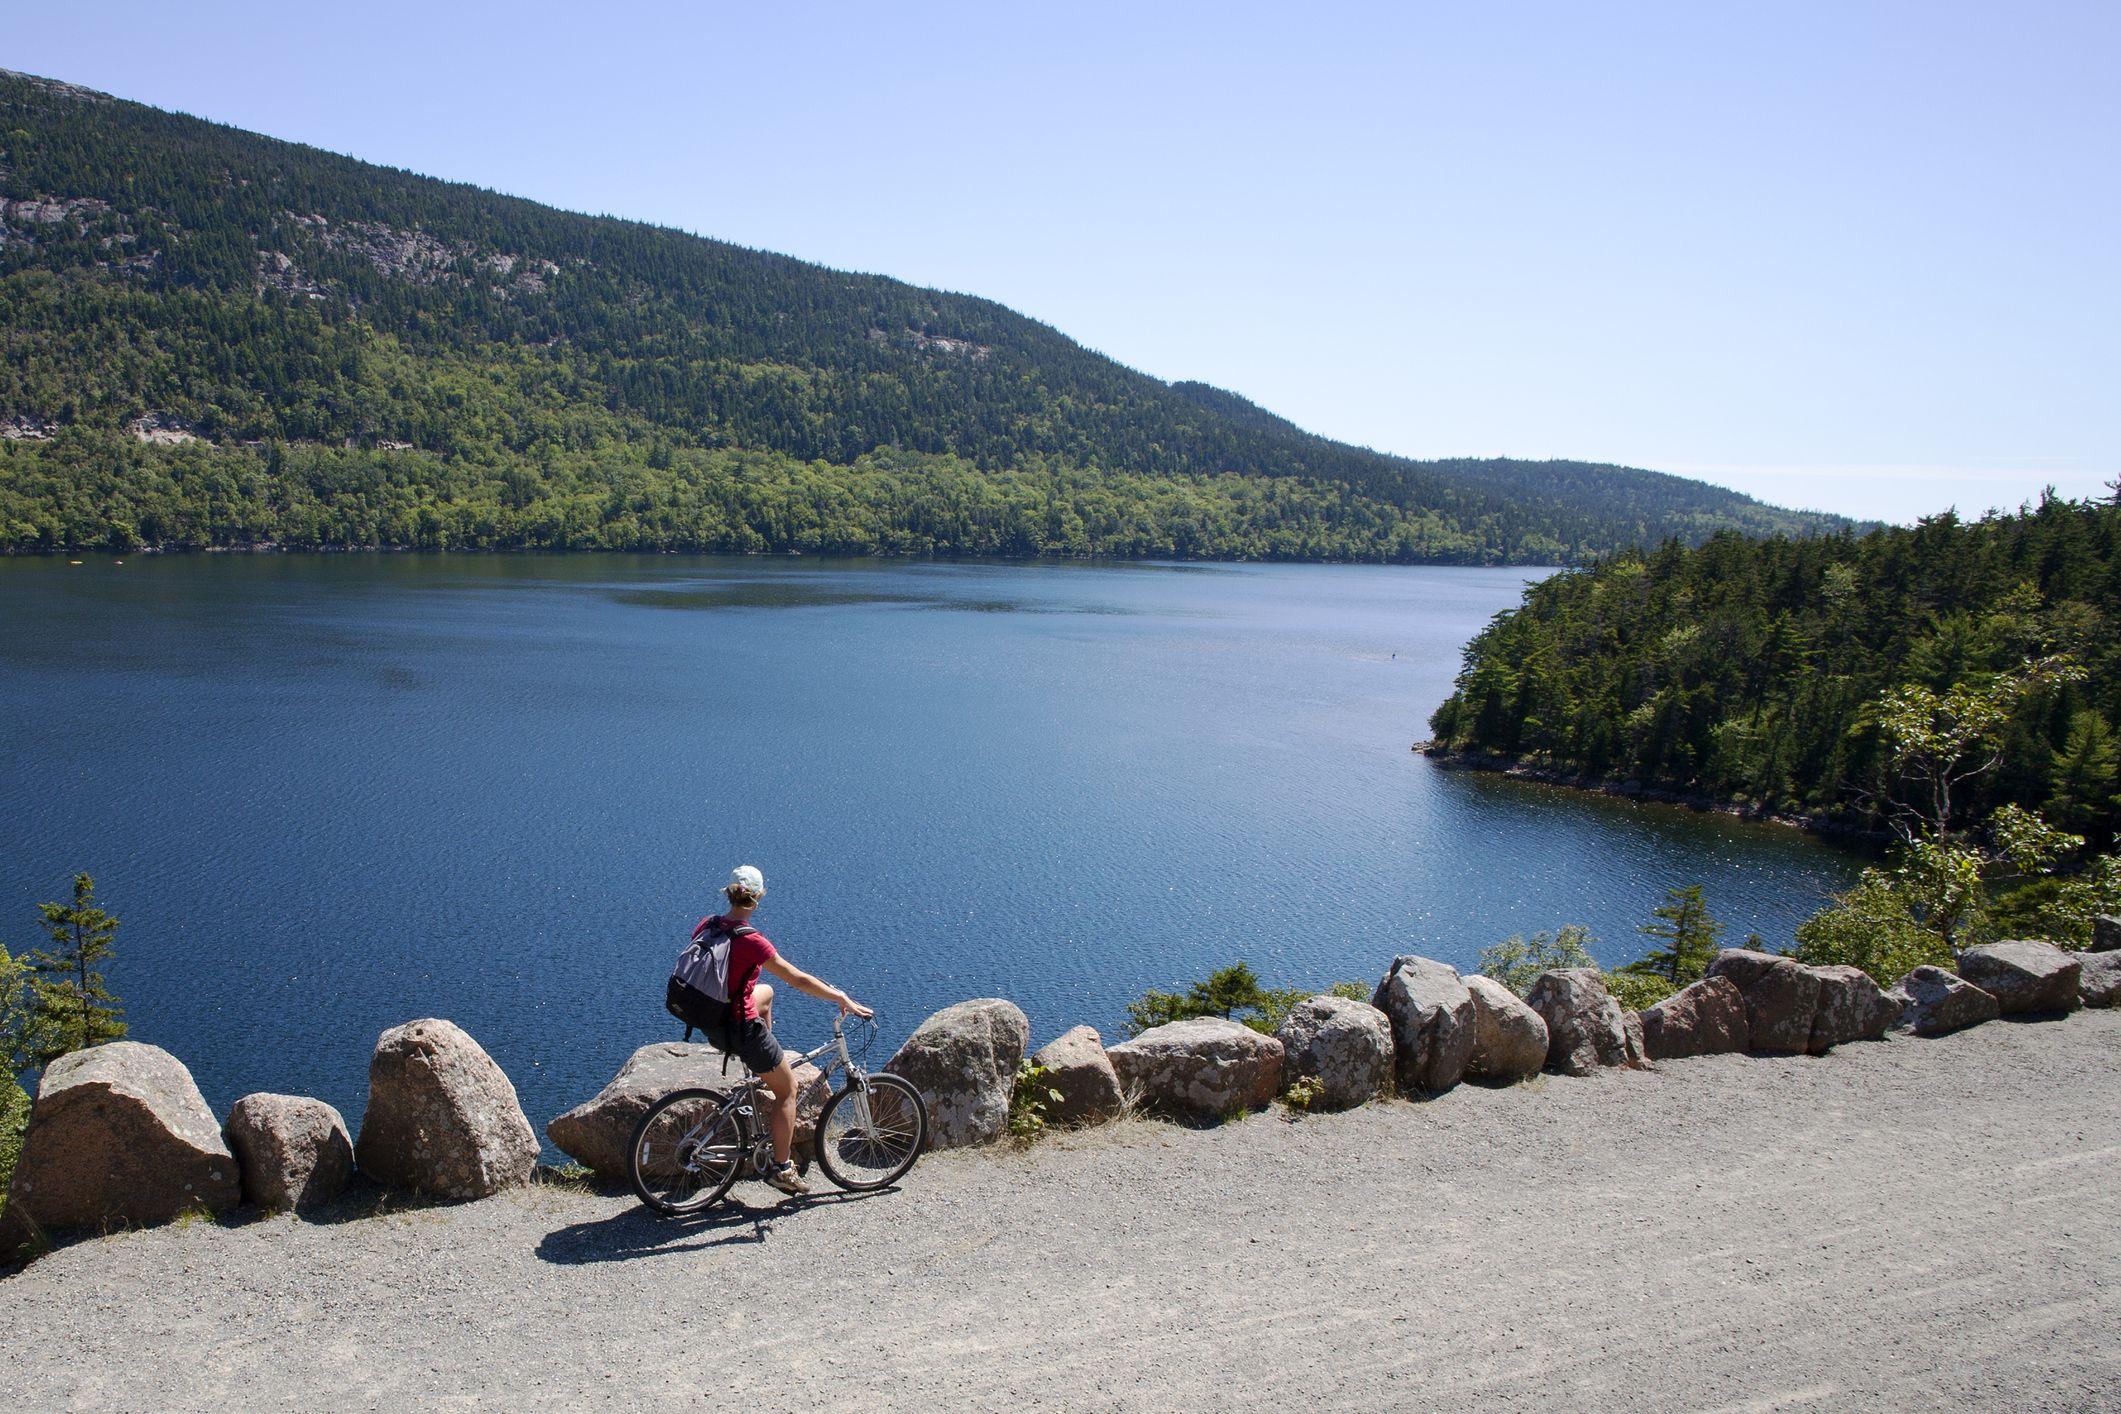 Cyclist by Jordan Pond